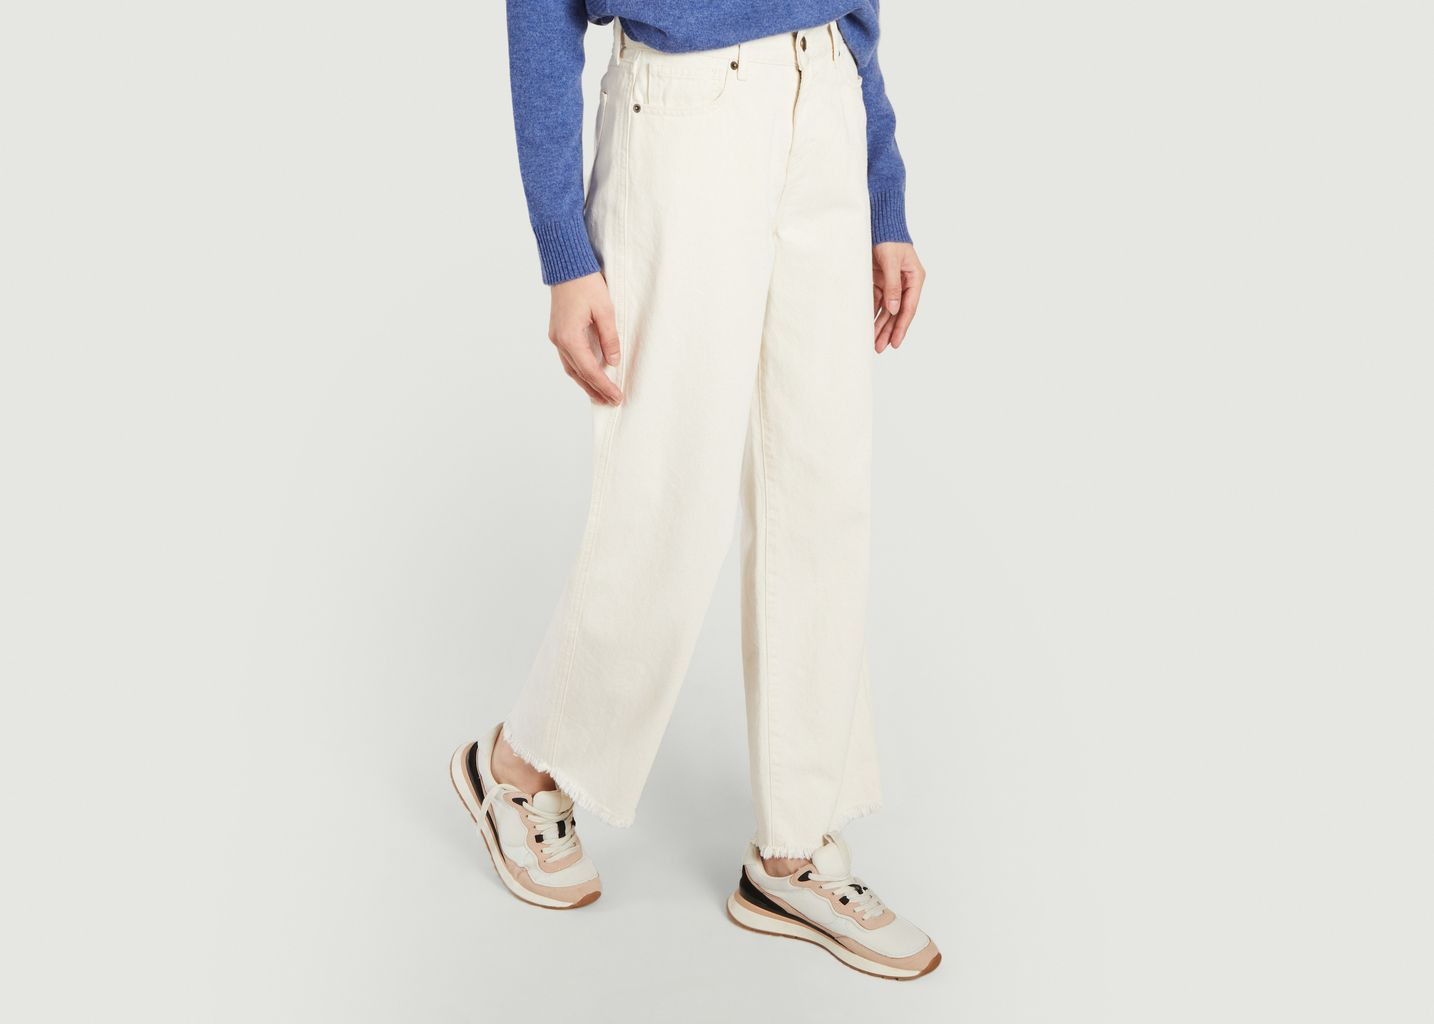 Jeans Line - Five